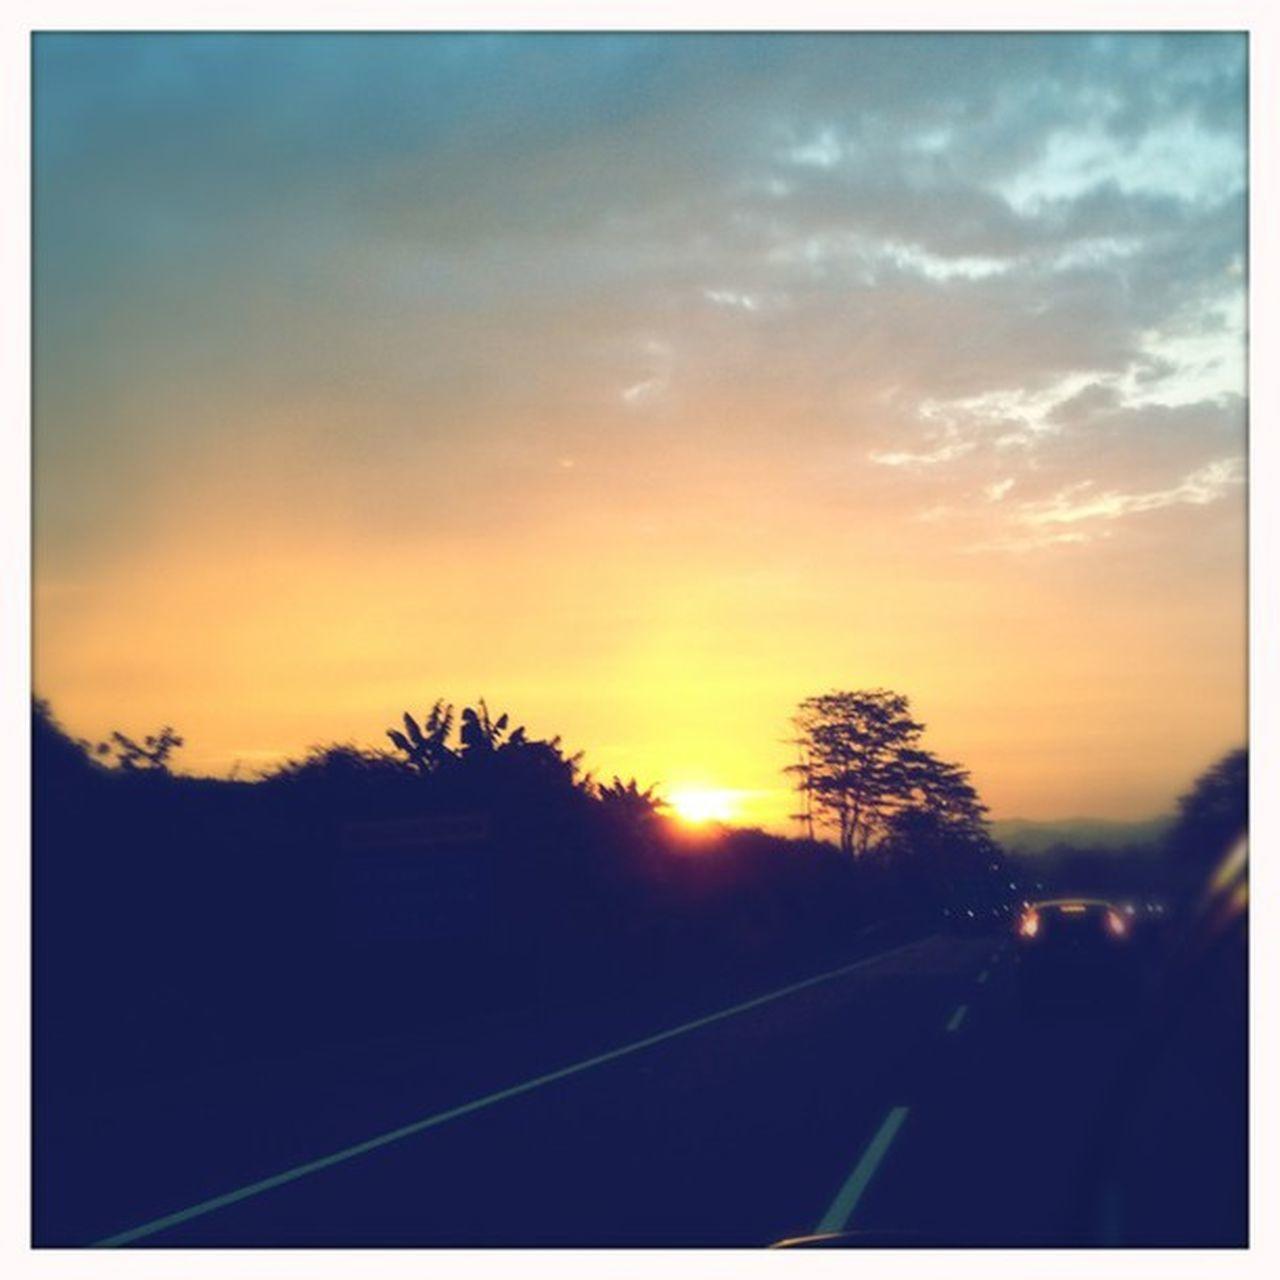 On the way Iphonesia Blur Makebeautiful @hipstachallenge @hipstamatic Hipstamatic Americana Blanko